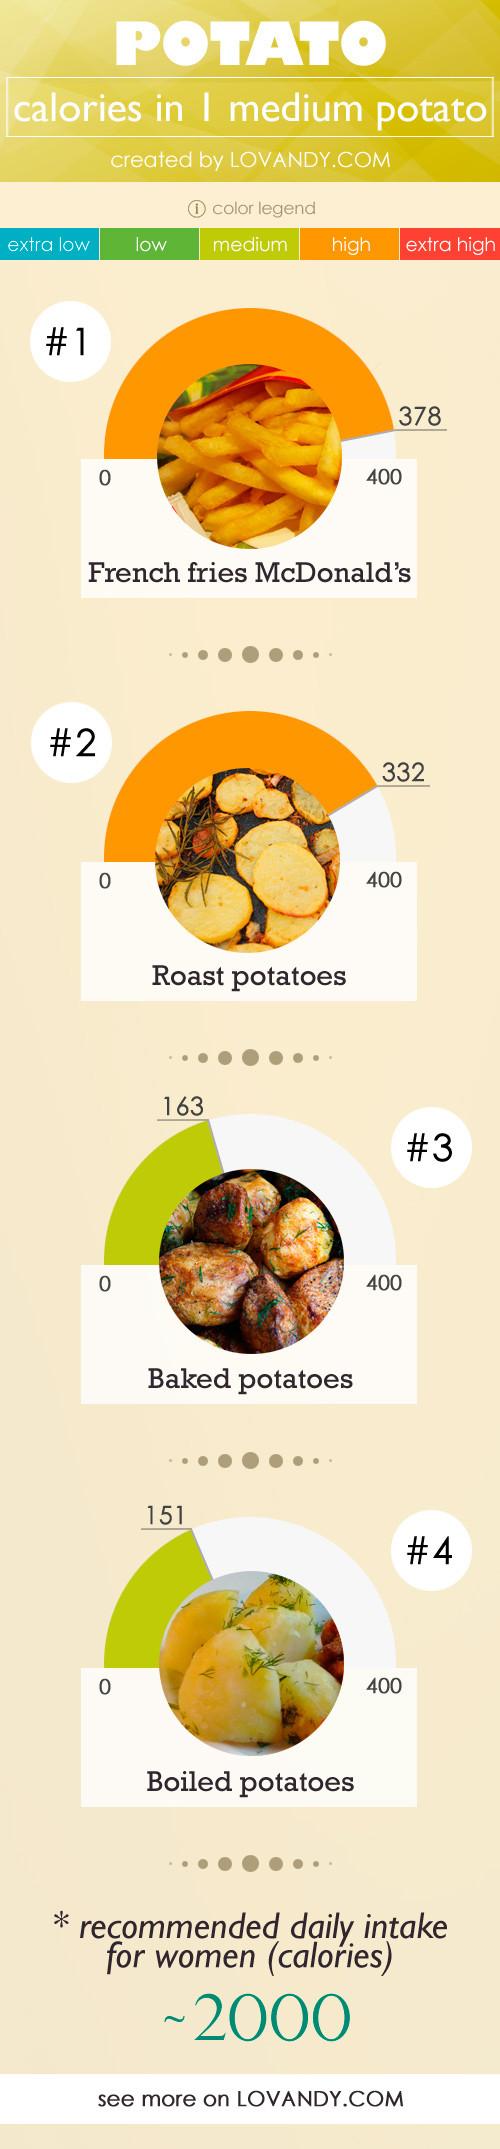 1 Potato Calories  Potato Calories Baked Mashed Roast per 1 potato 100g